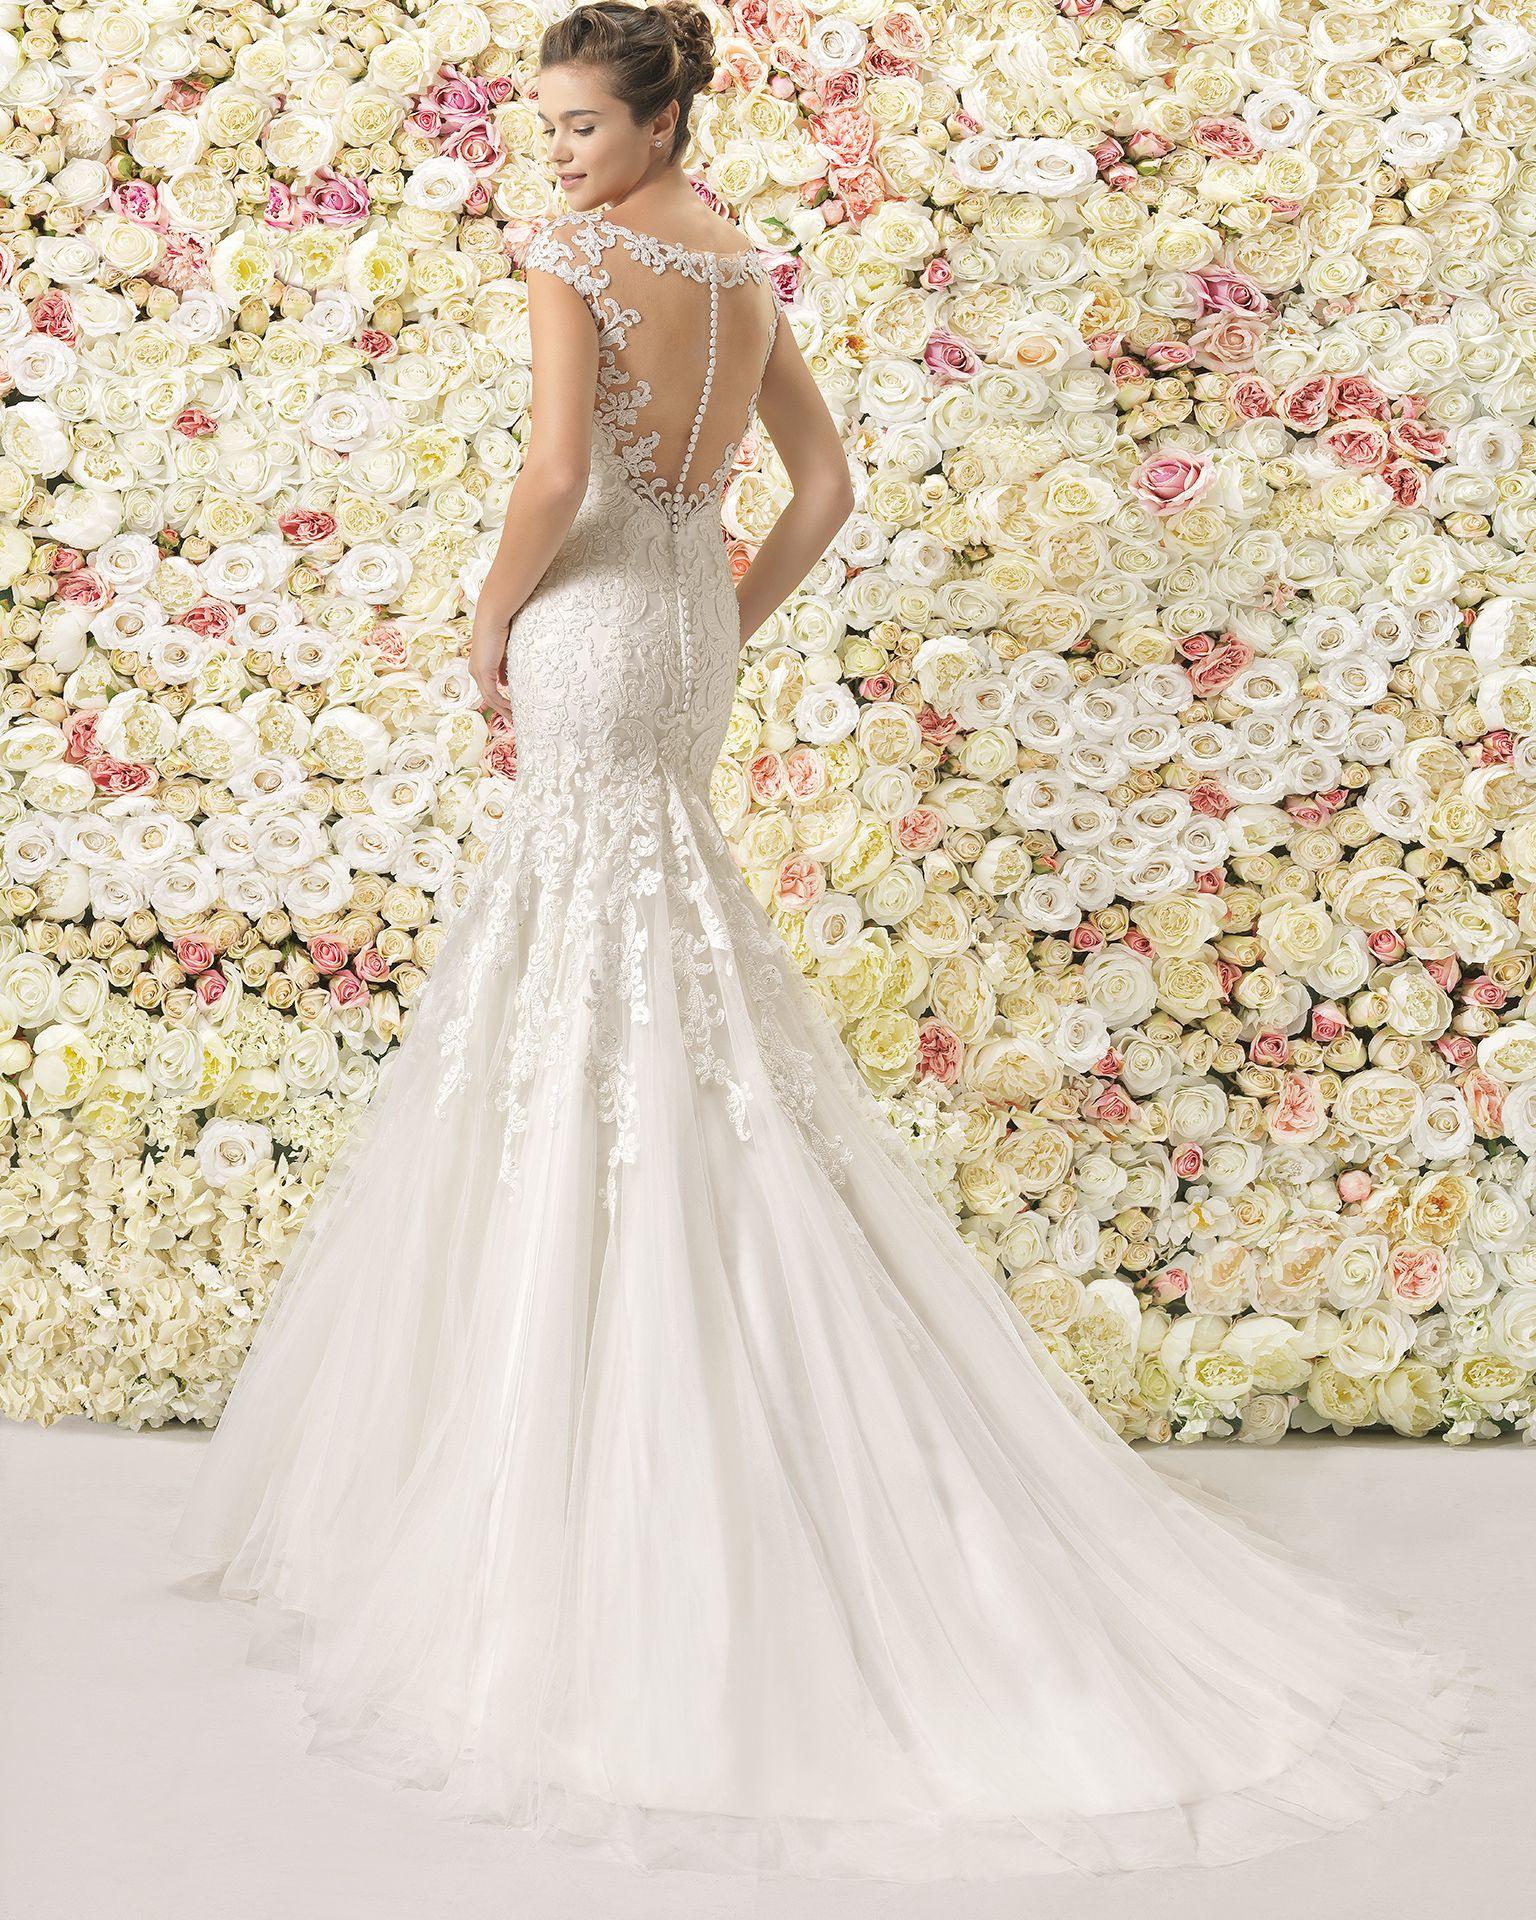 Caspio  2017 Bridal Collection Aire Barcelona  Kleid